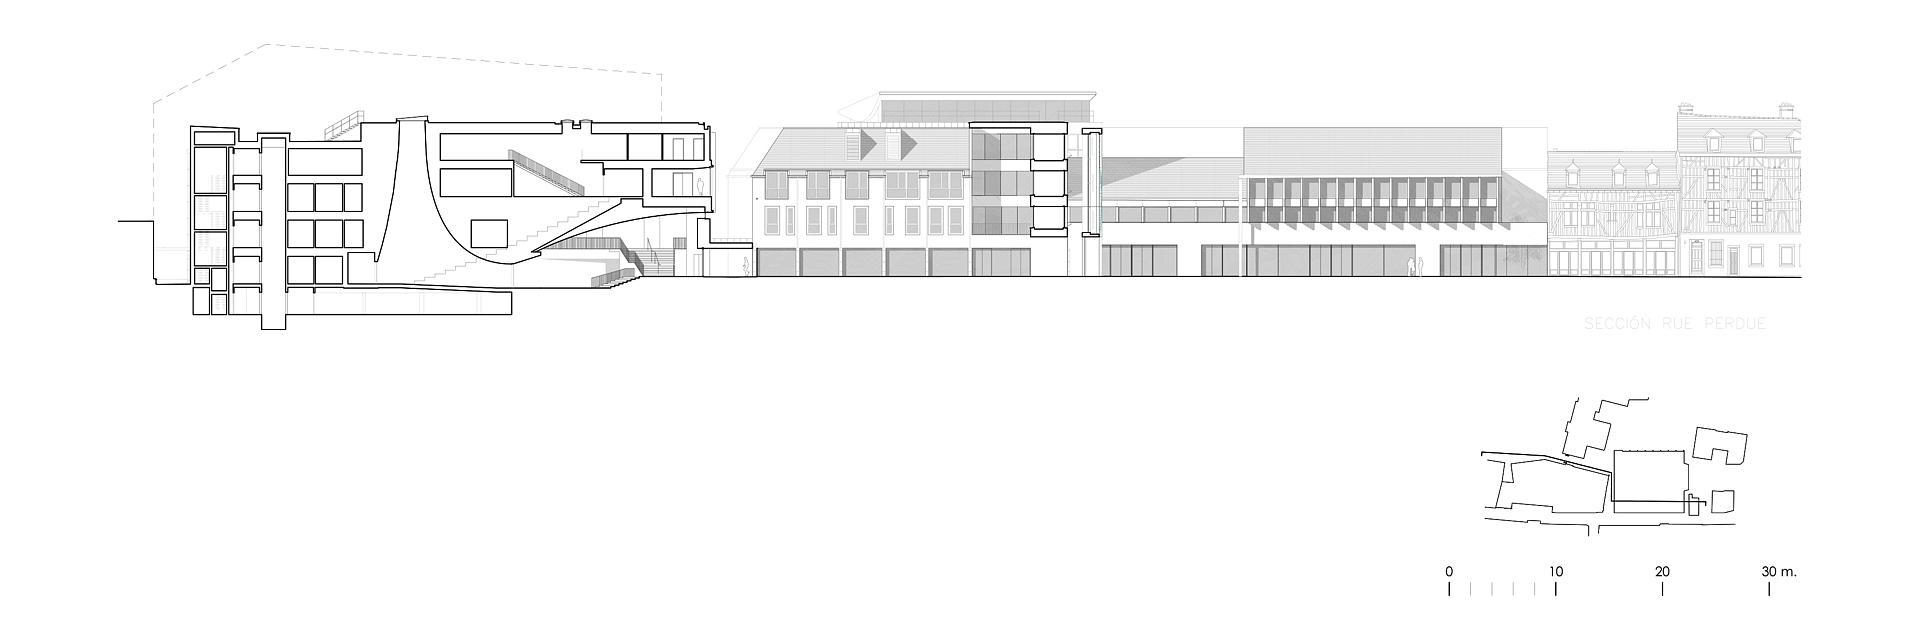 Linazasoro Sanchez: Troyes office and congress centre